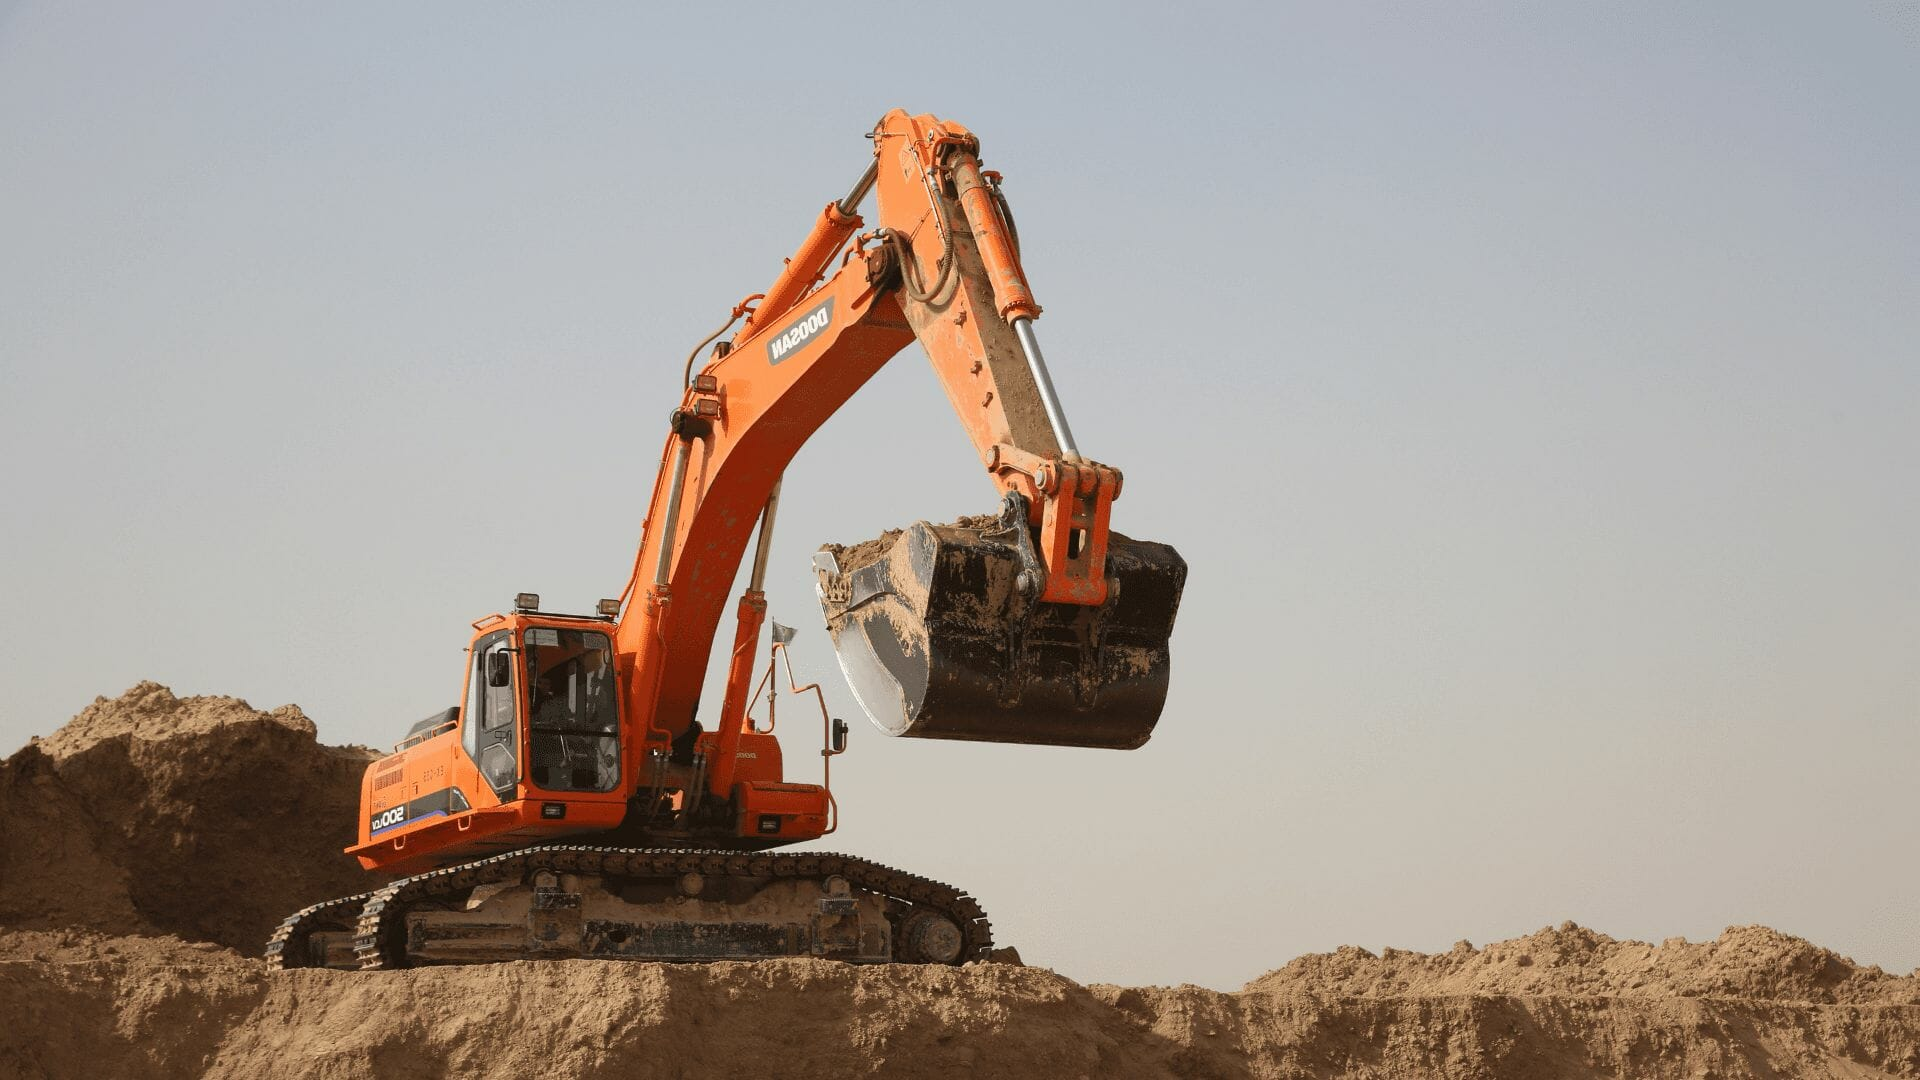 asa-finance-excavator-earthmovers-cover